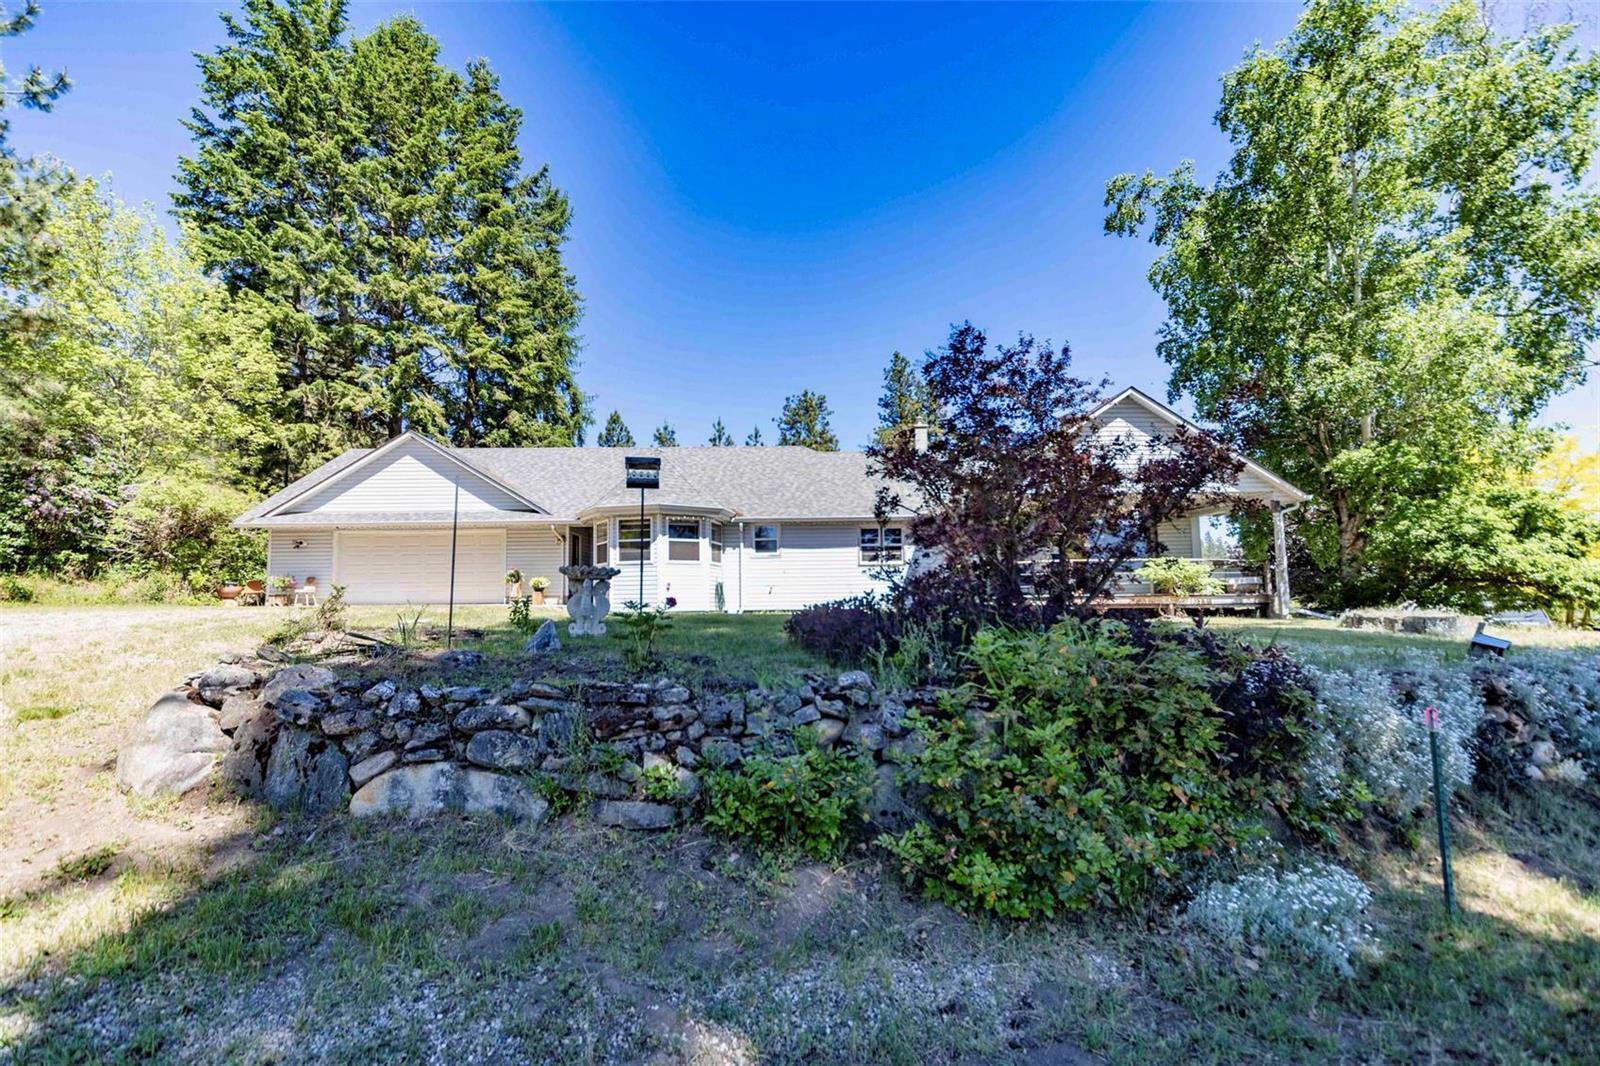 4602 Schubert Road,, Armstrong, British Columbia  V0E 1B4 - Photo 4 - 10232684